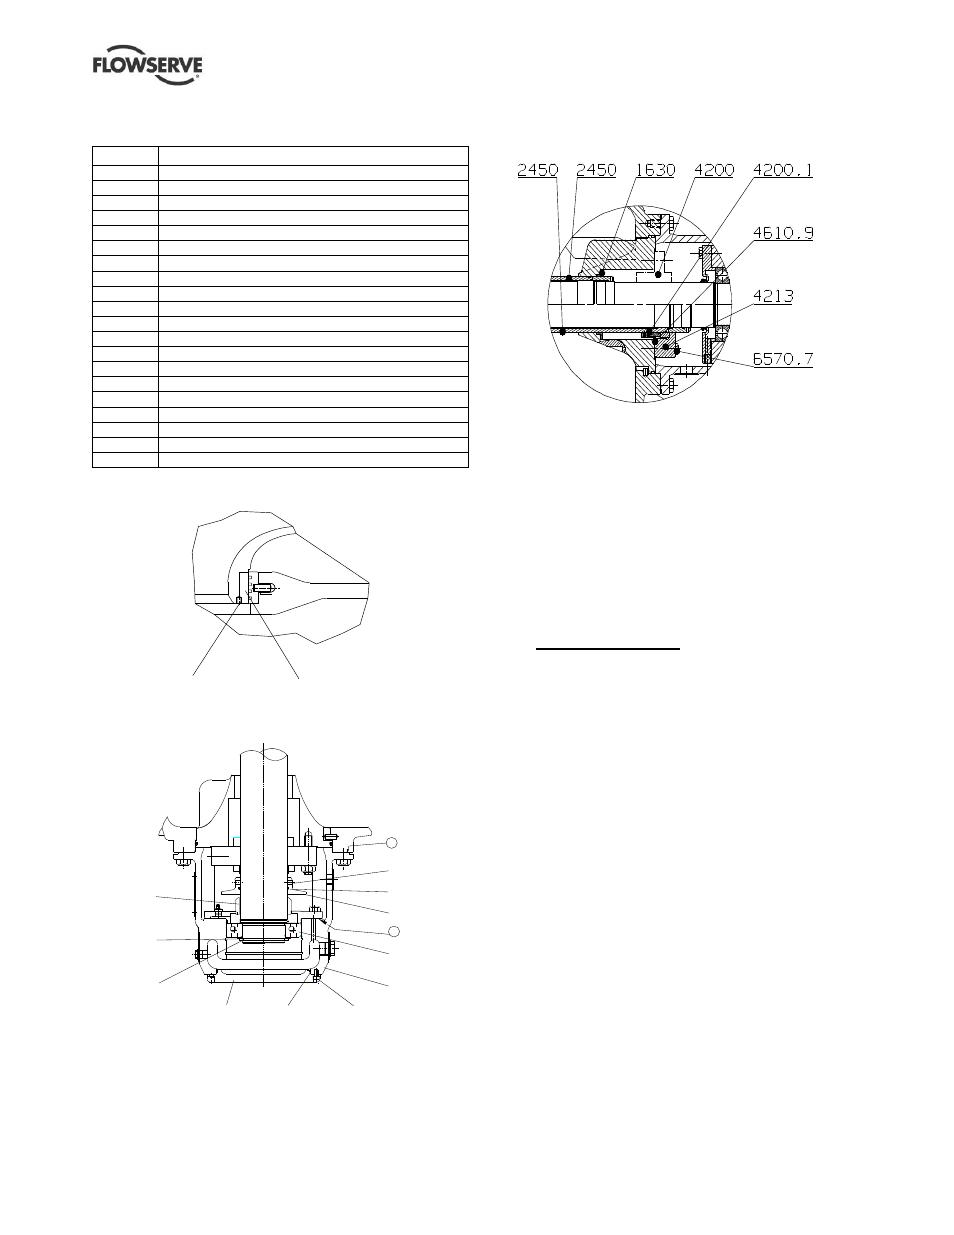 General arrangement drawing, Certification, Certification